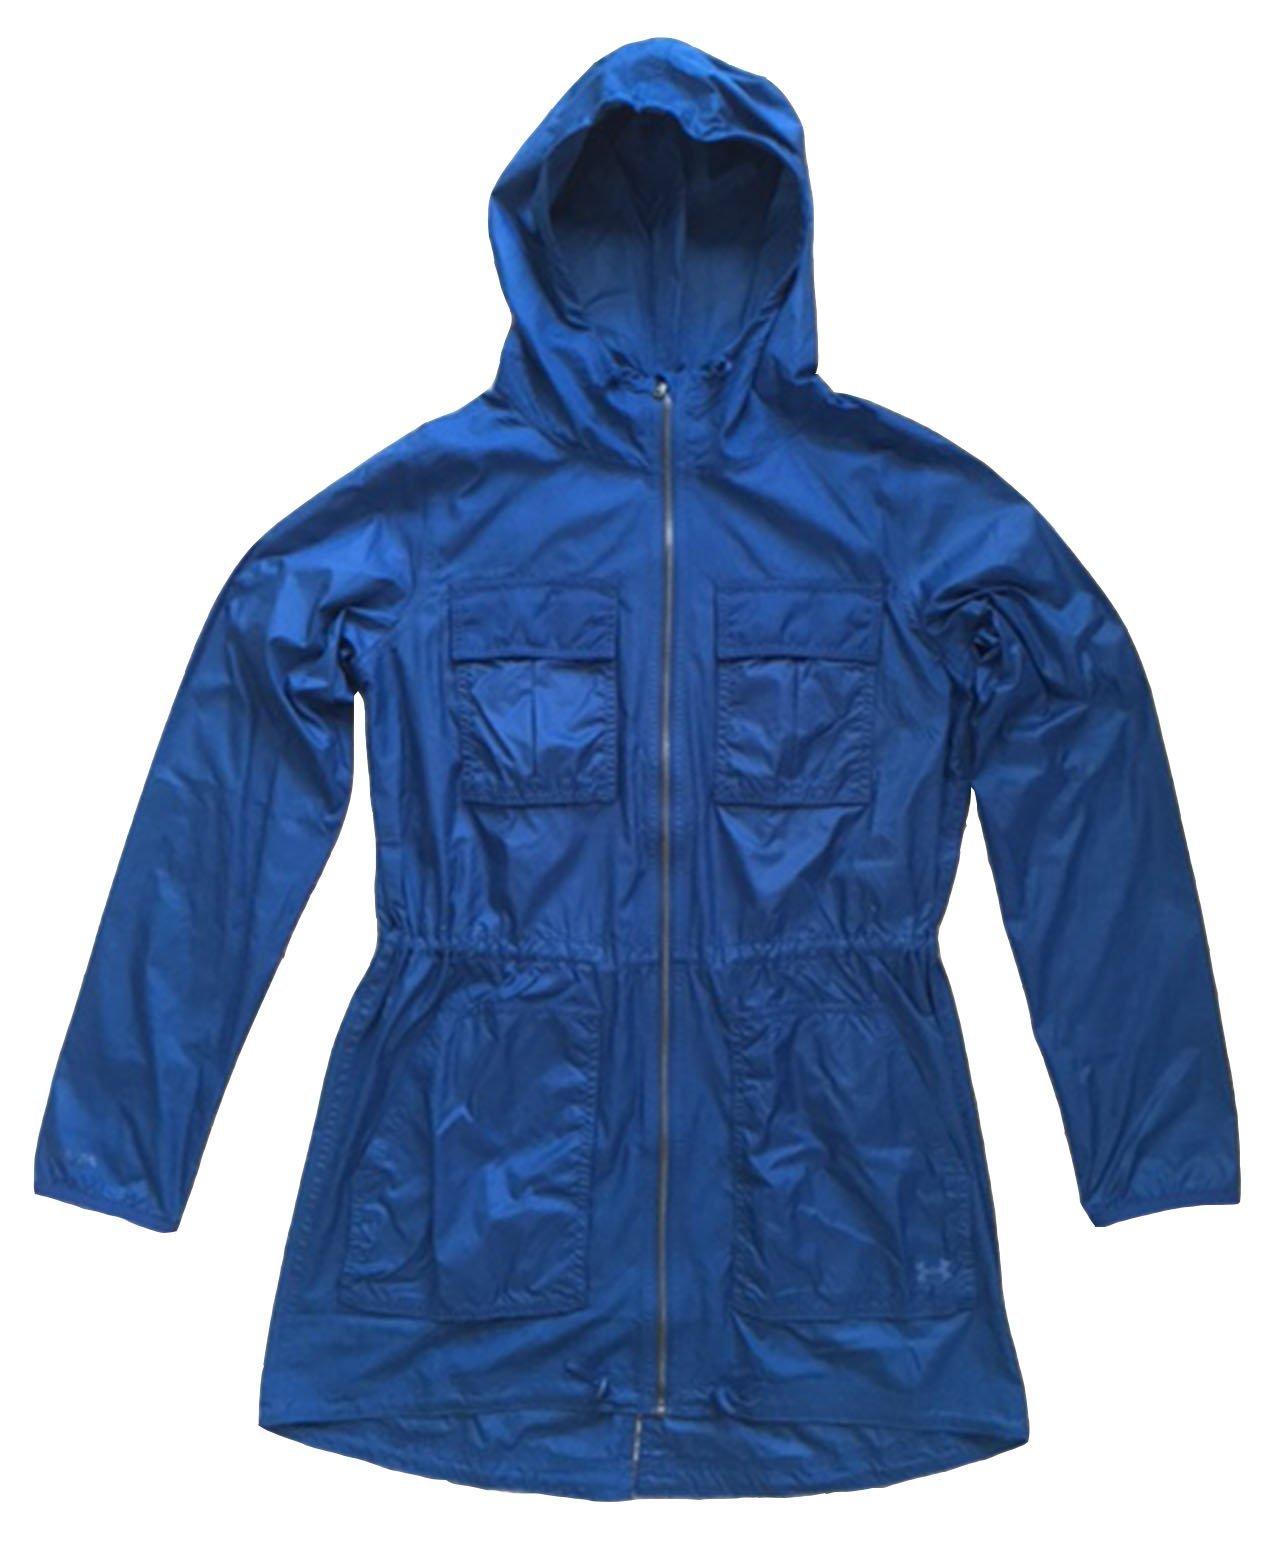 Under Armour Women UA Storm Cargo Lightweight Rain Jacket (XS, Jazz blue)